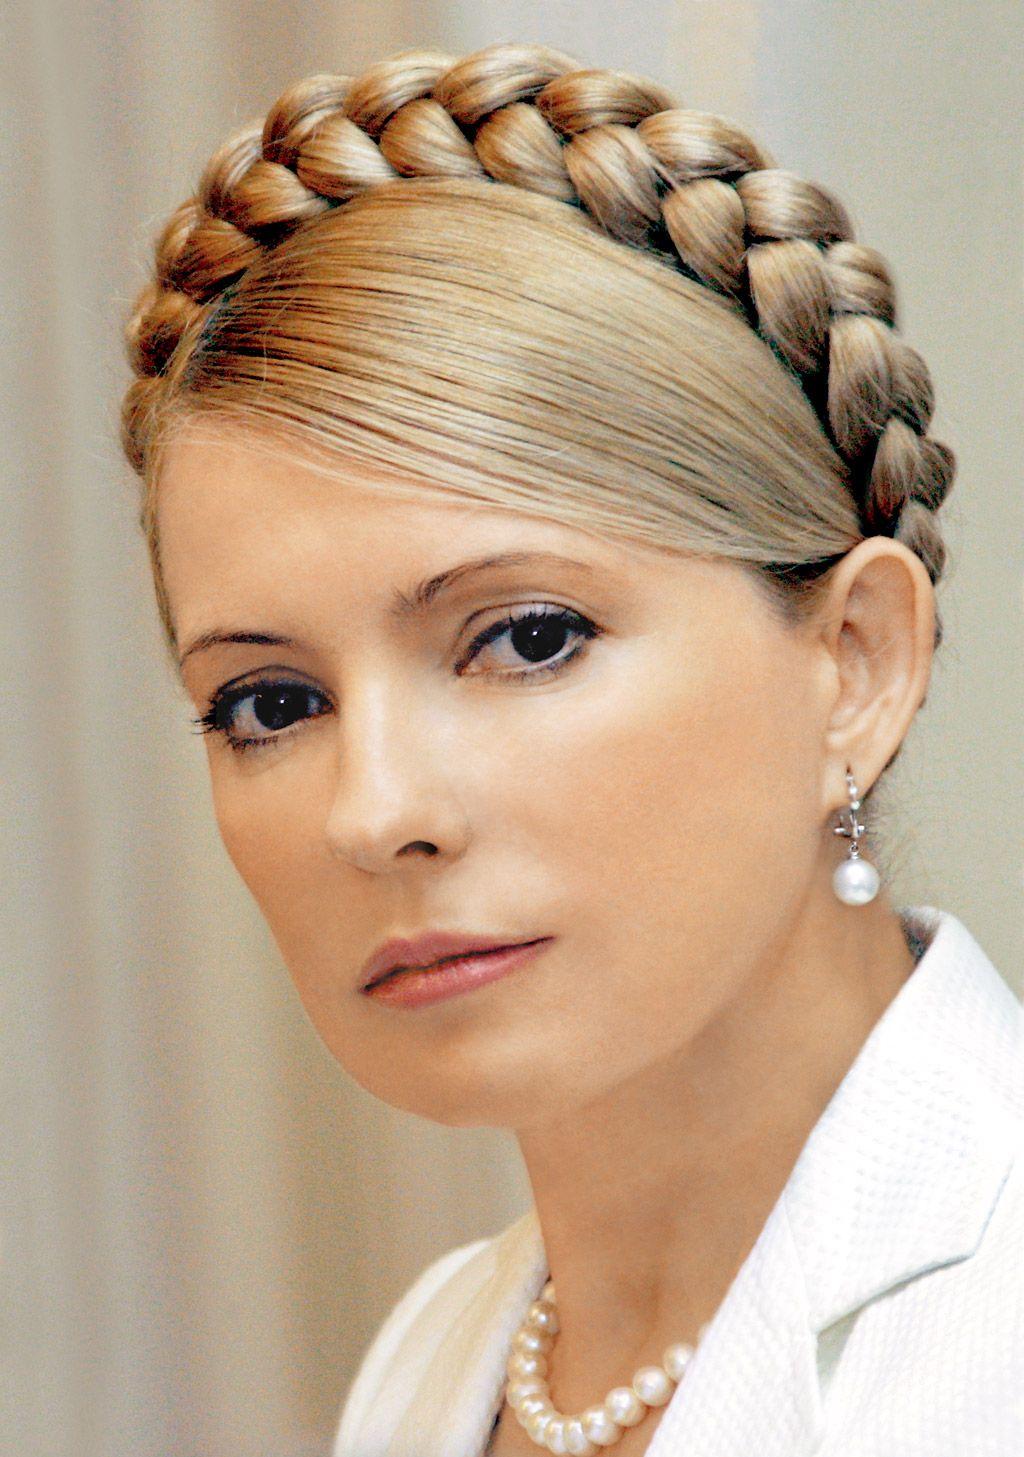 30+ Femme russe coiffure inspiration